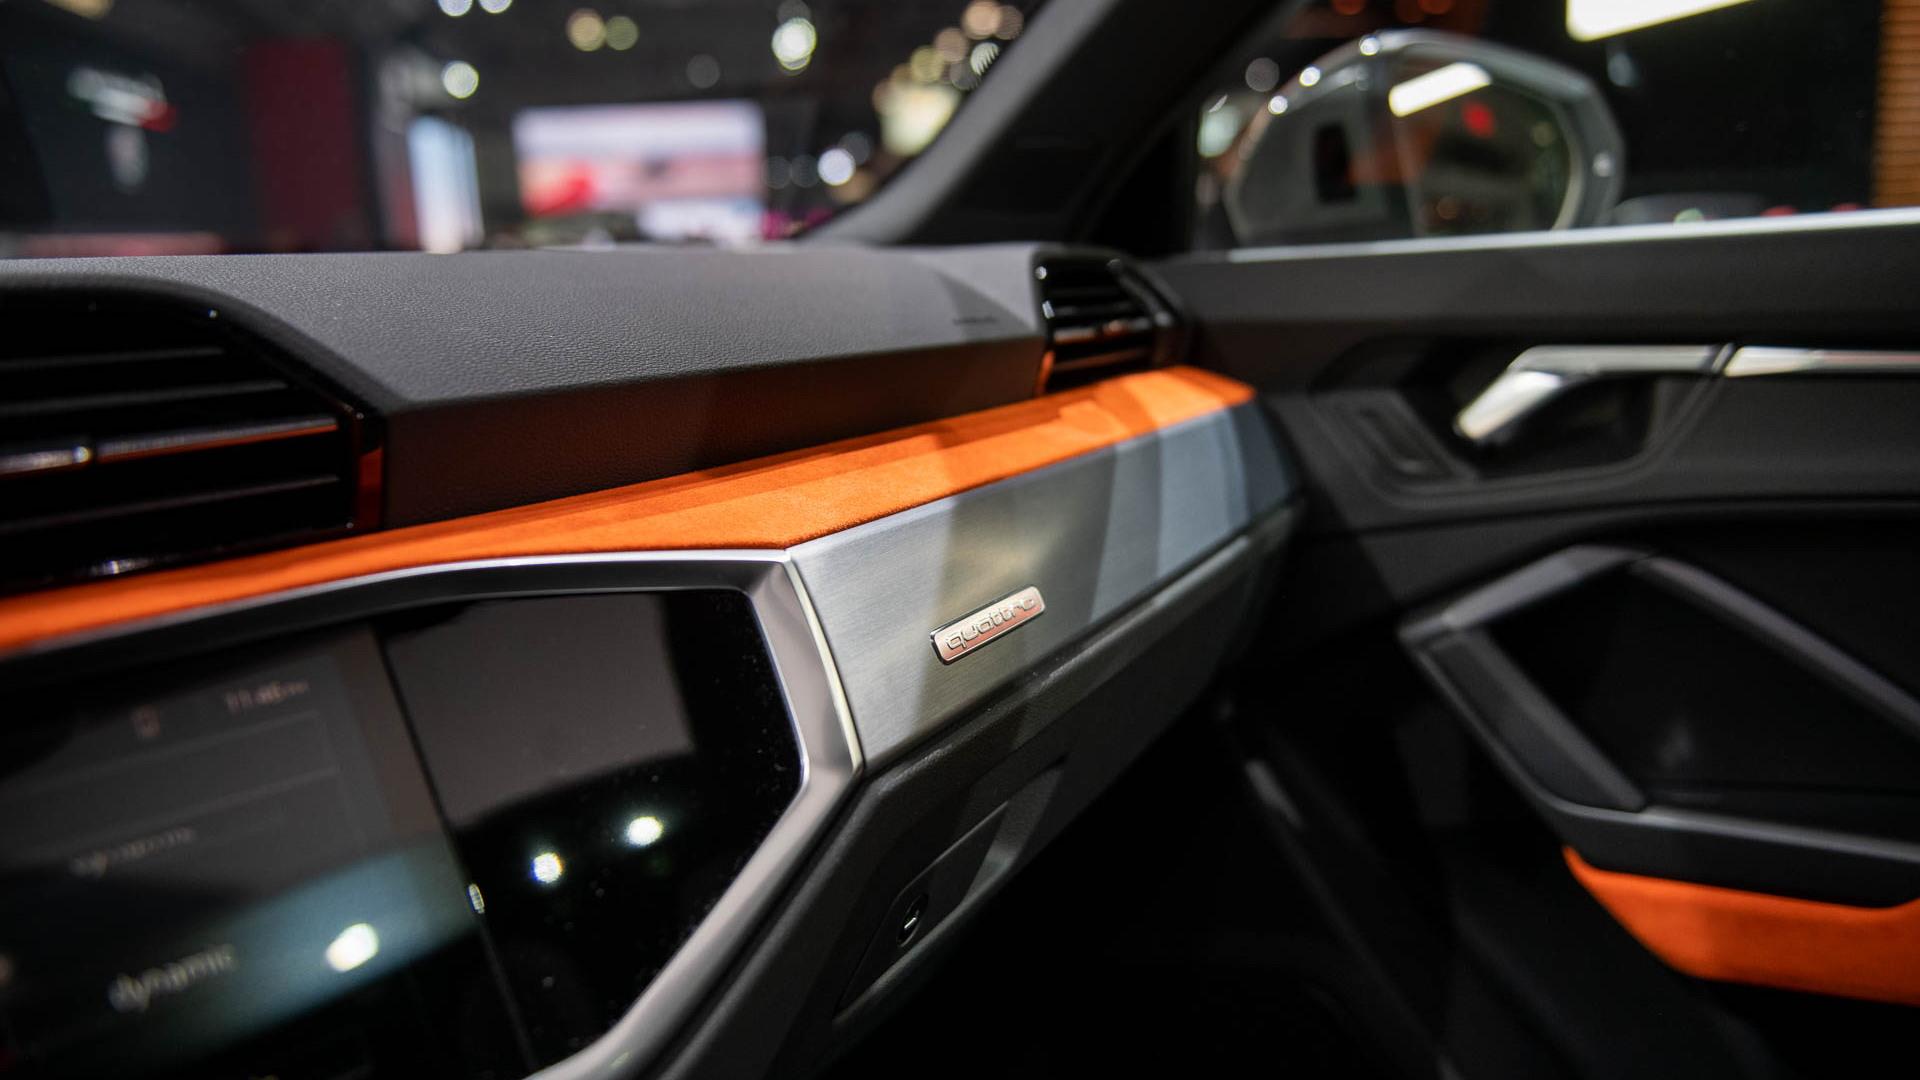 2019 Audi Q3, 2019 New york International Auto Show